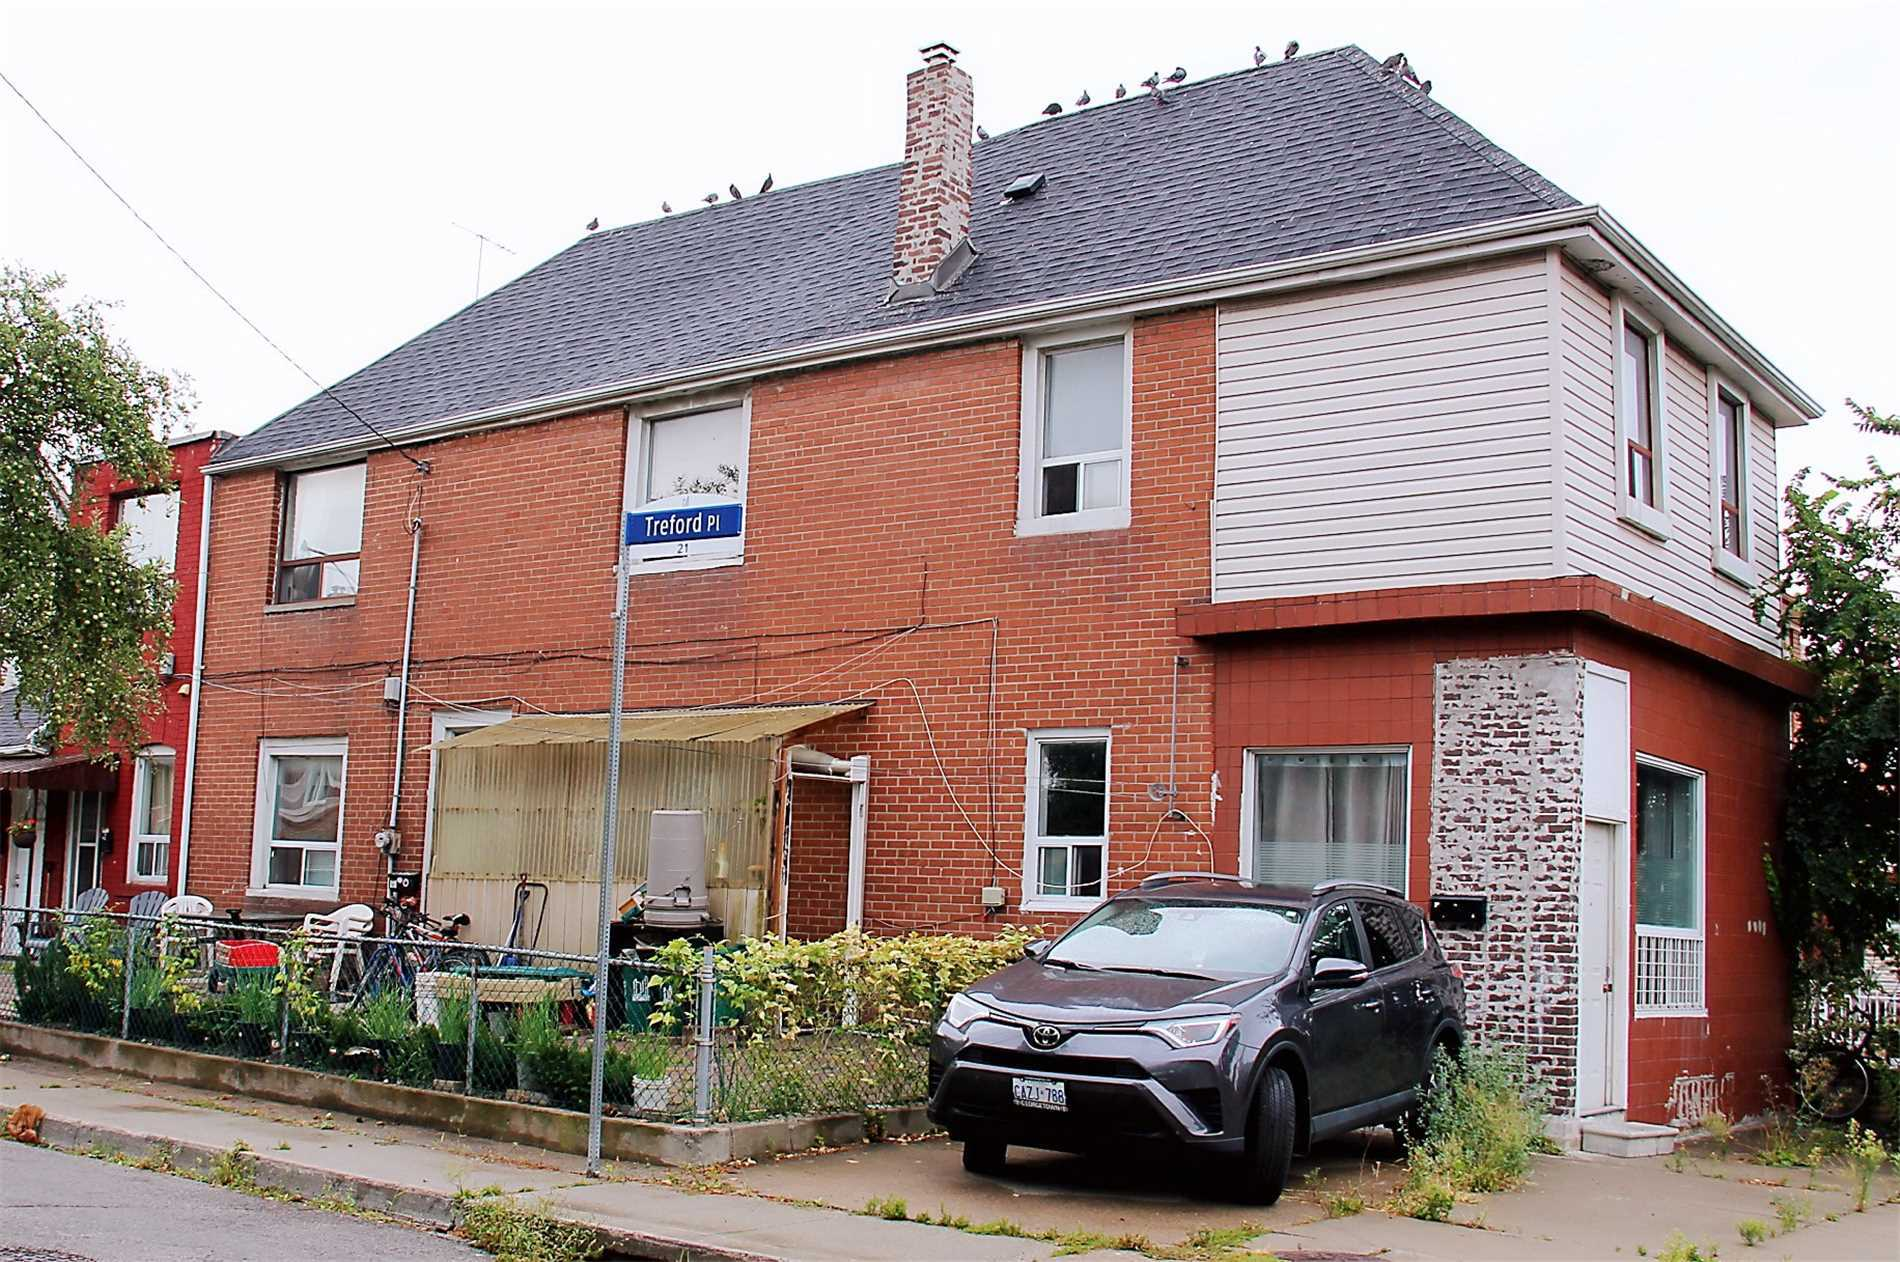 229 Bellwoods Ave, Toronto, Ontario M6J2R2, 8 Bedrooms Bedrooms, 14 Rooms Rooms,6 BathroomsBathrooms,Detached,For Sale,Bellwoods,C4961757